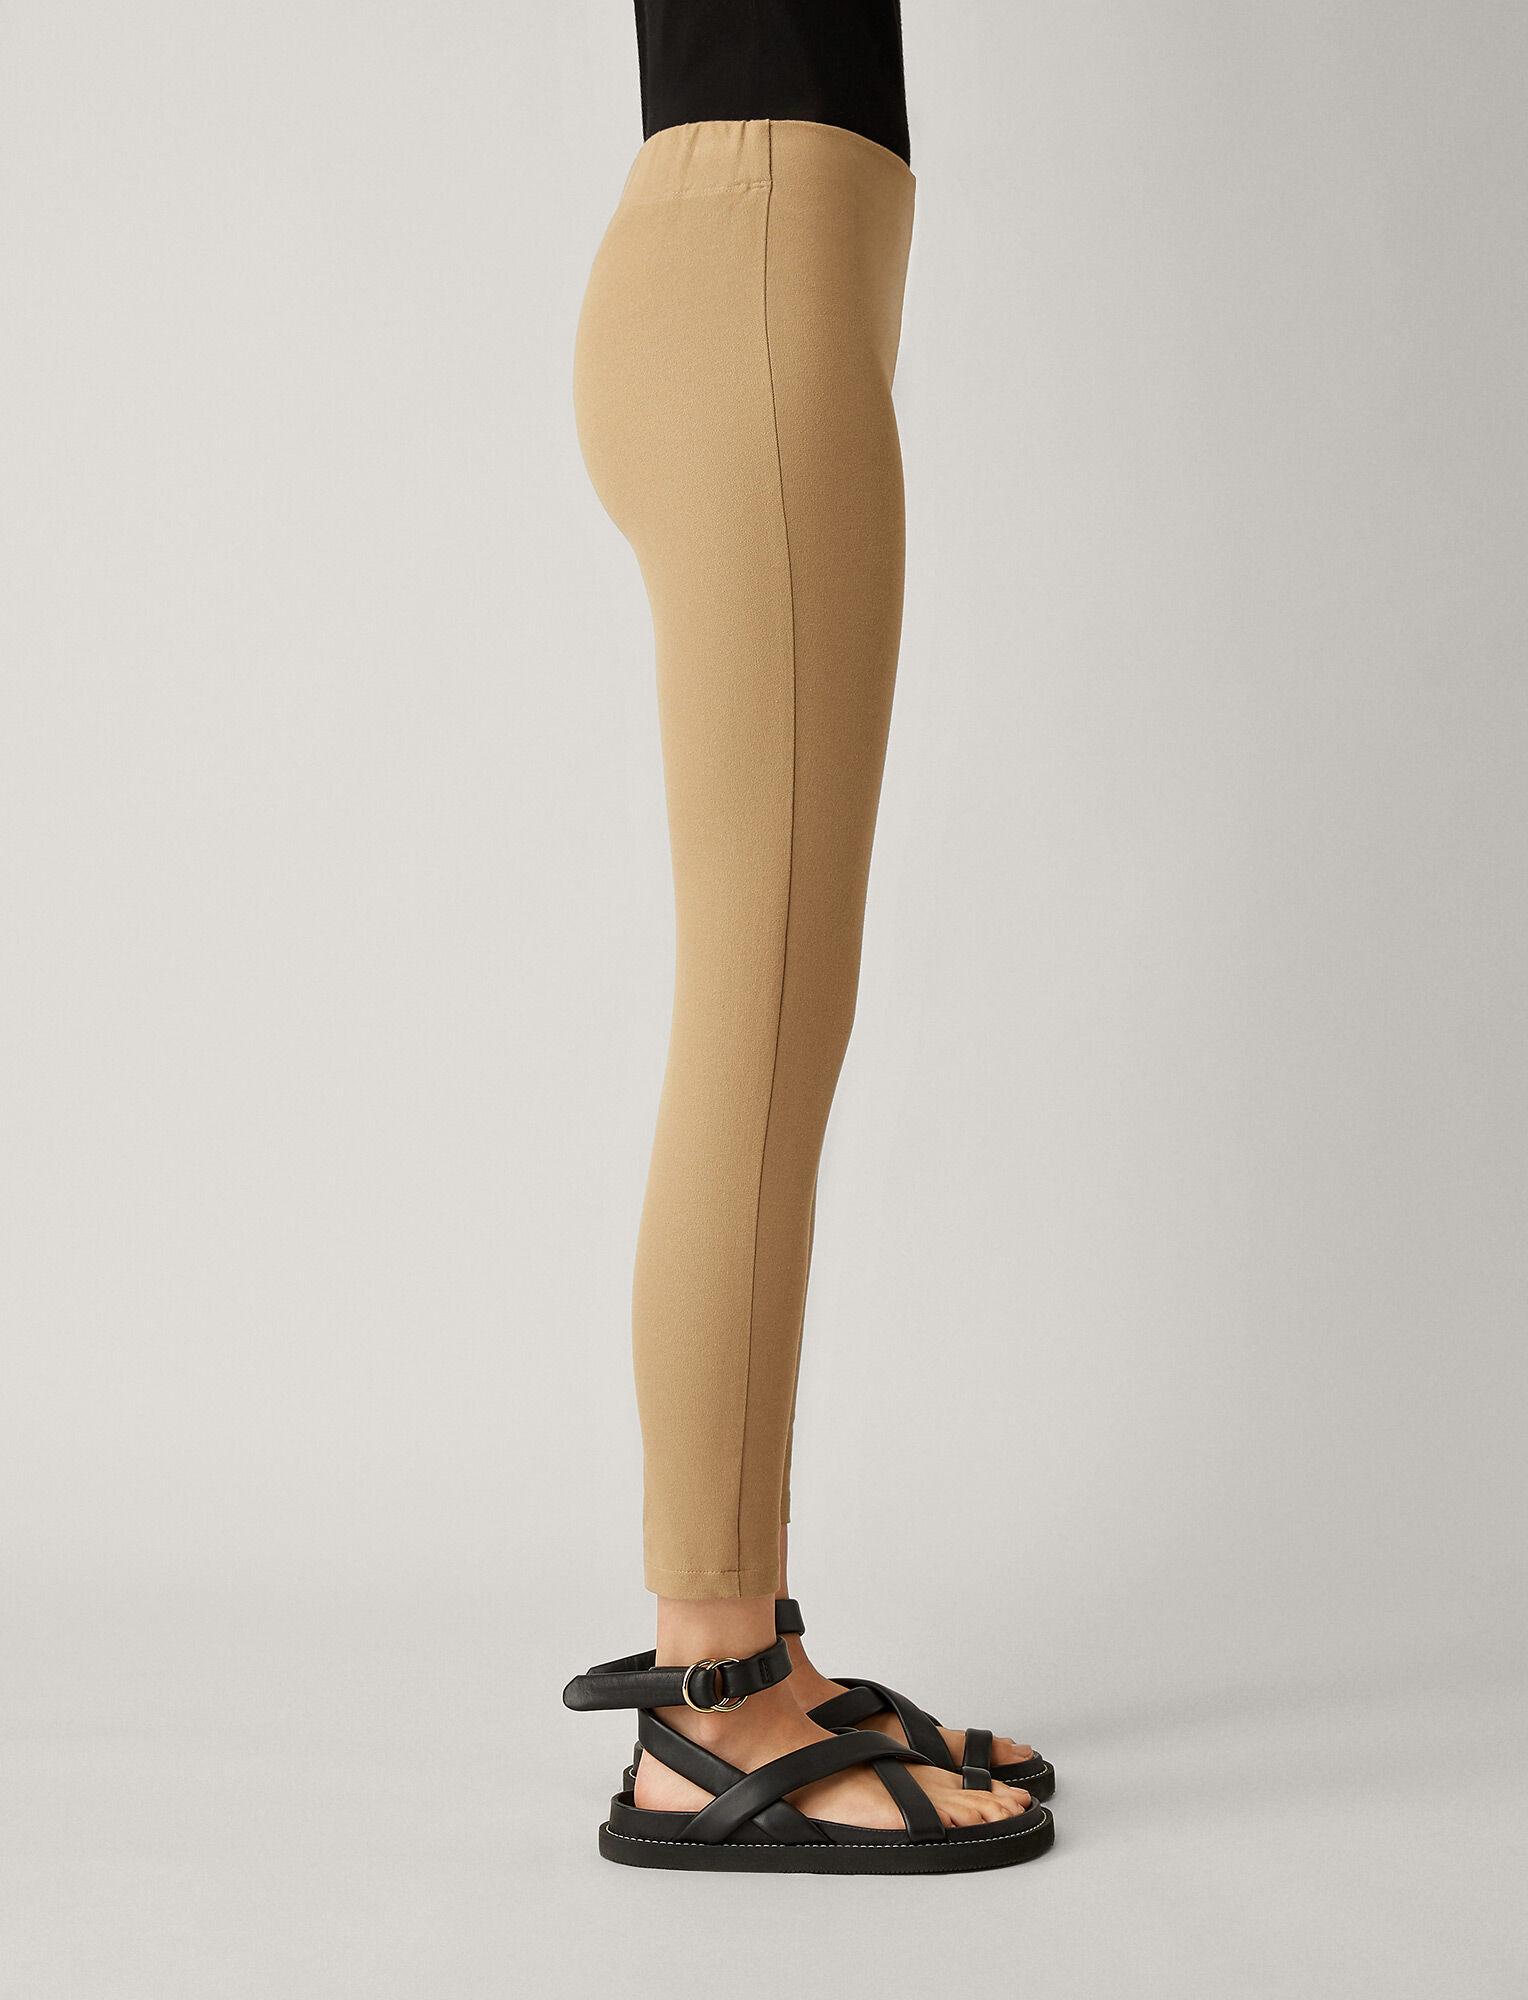 Joseph, Nitro Gabardine Stretch Leggings, in CAMEL